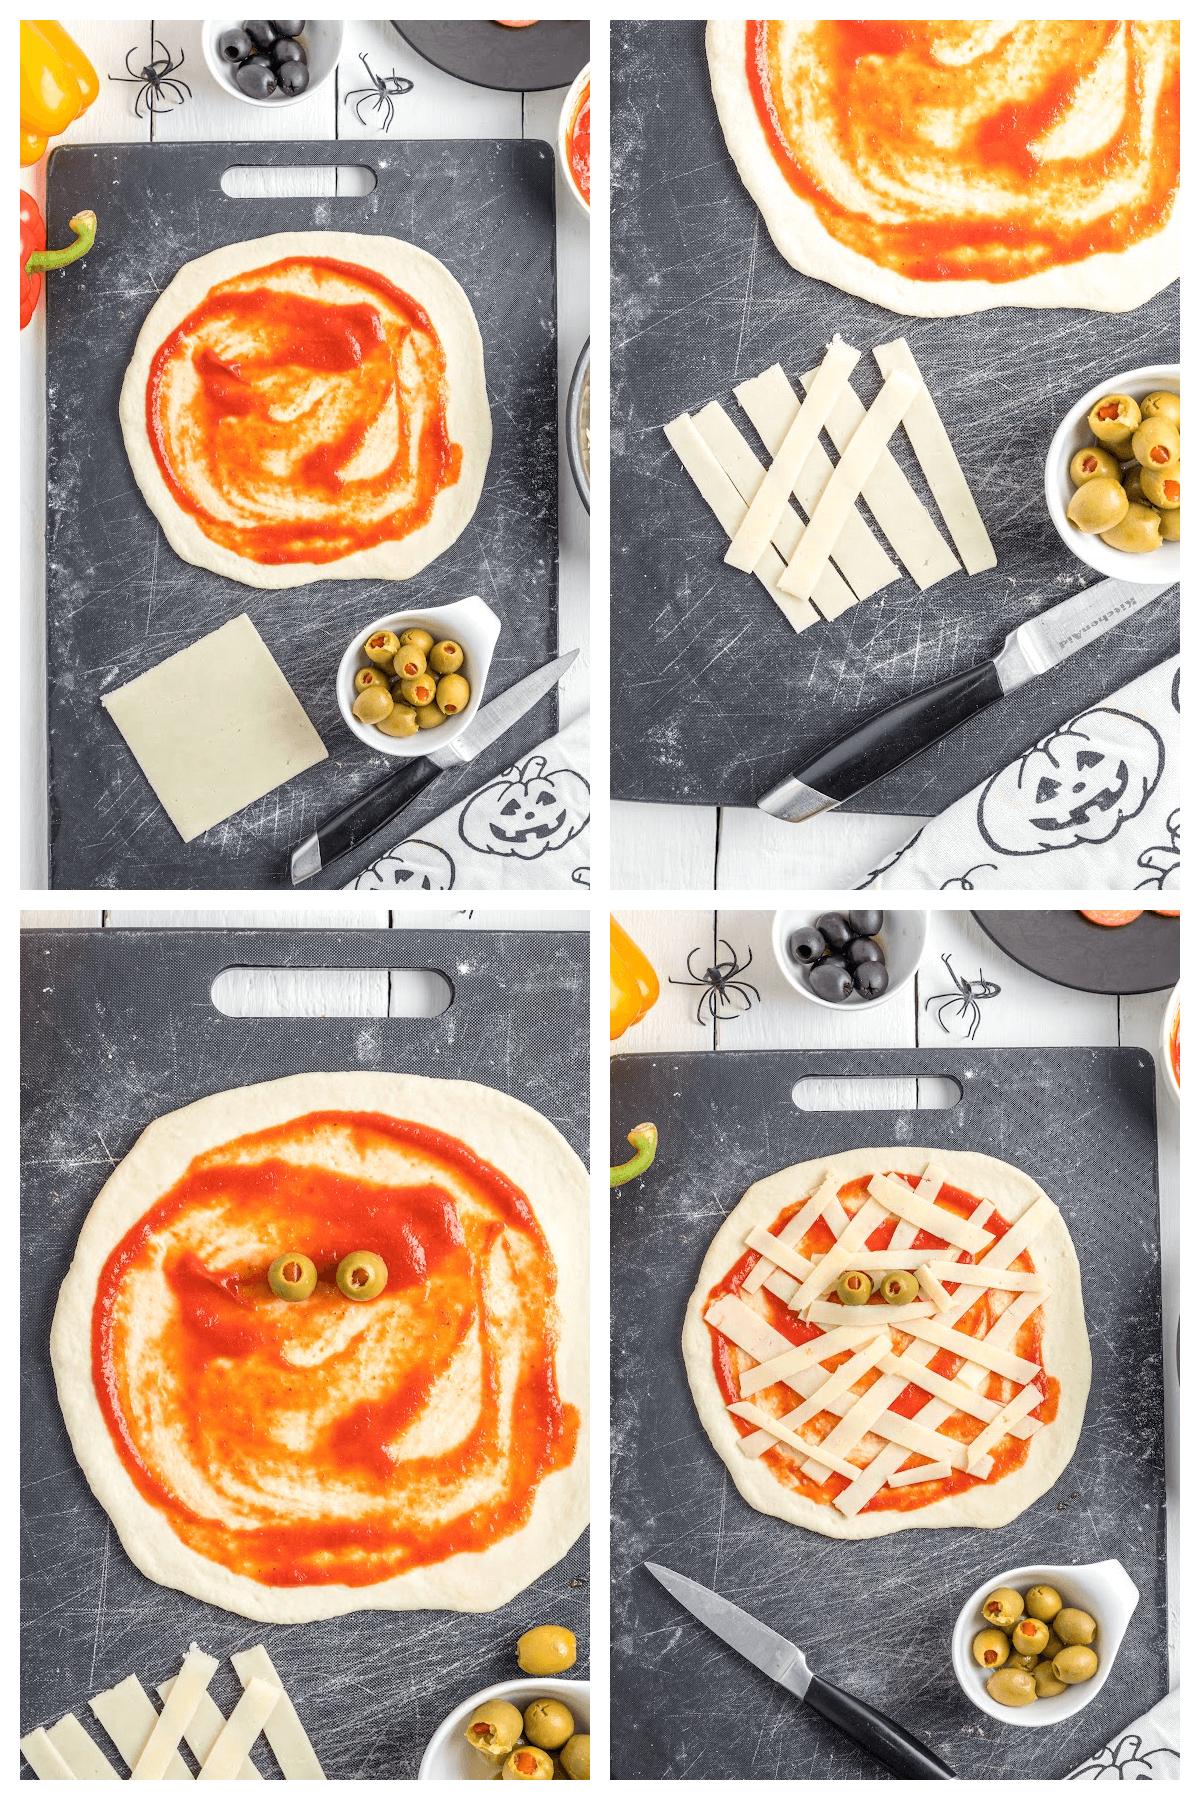 Mummy mini-pizza step-by-step instructions.